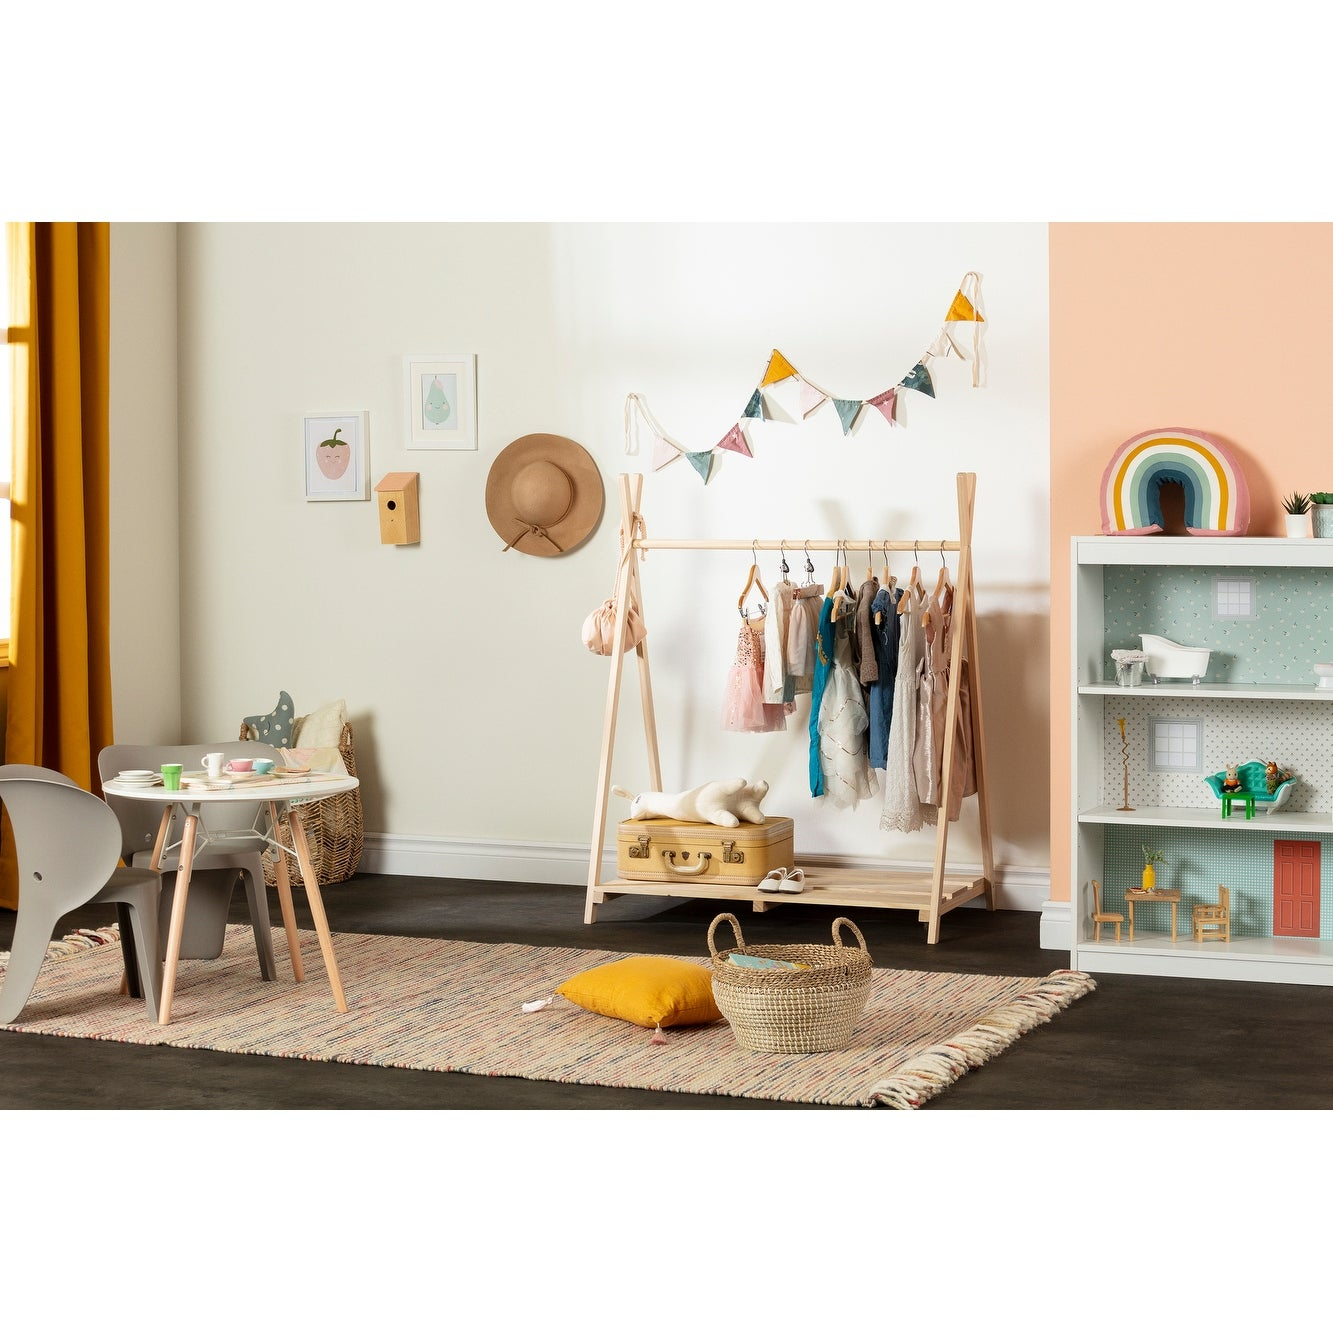 South Shore Sweedi Scandinavian Clothes Rack For Kids Overstock 30804177